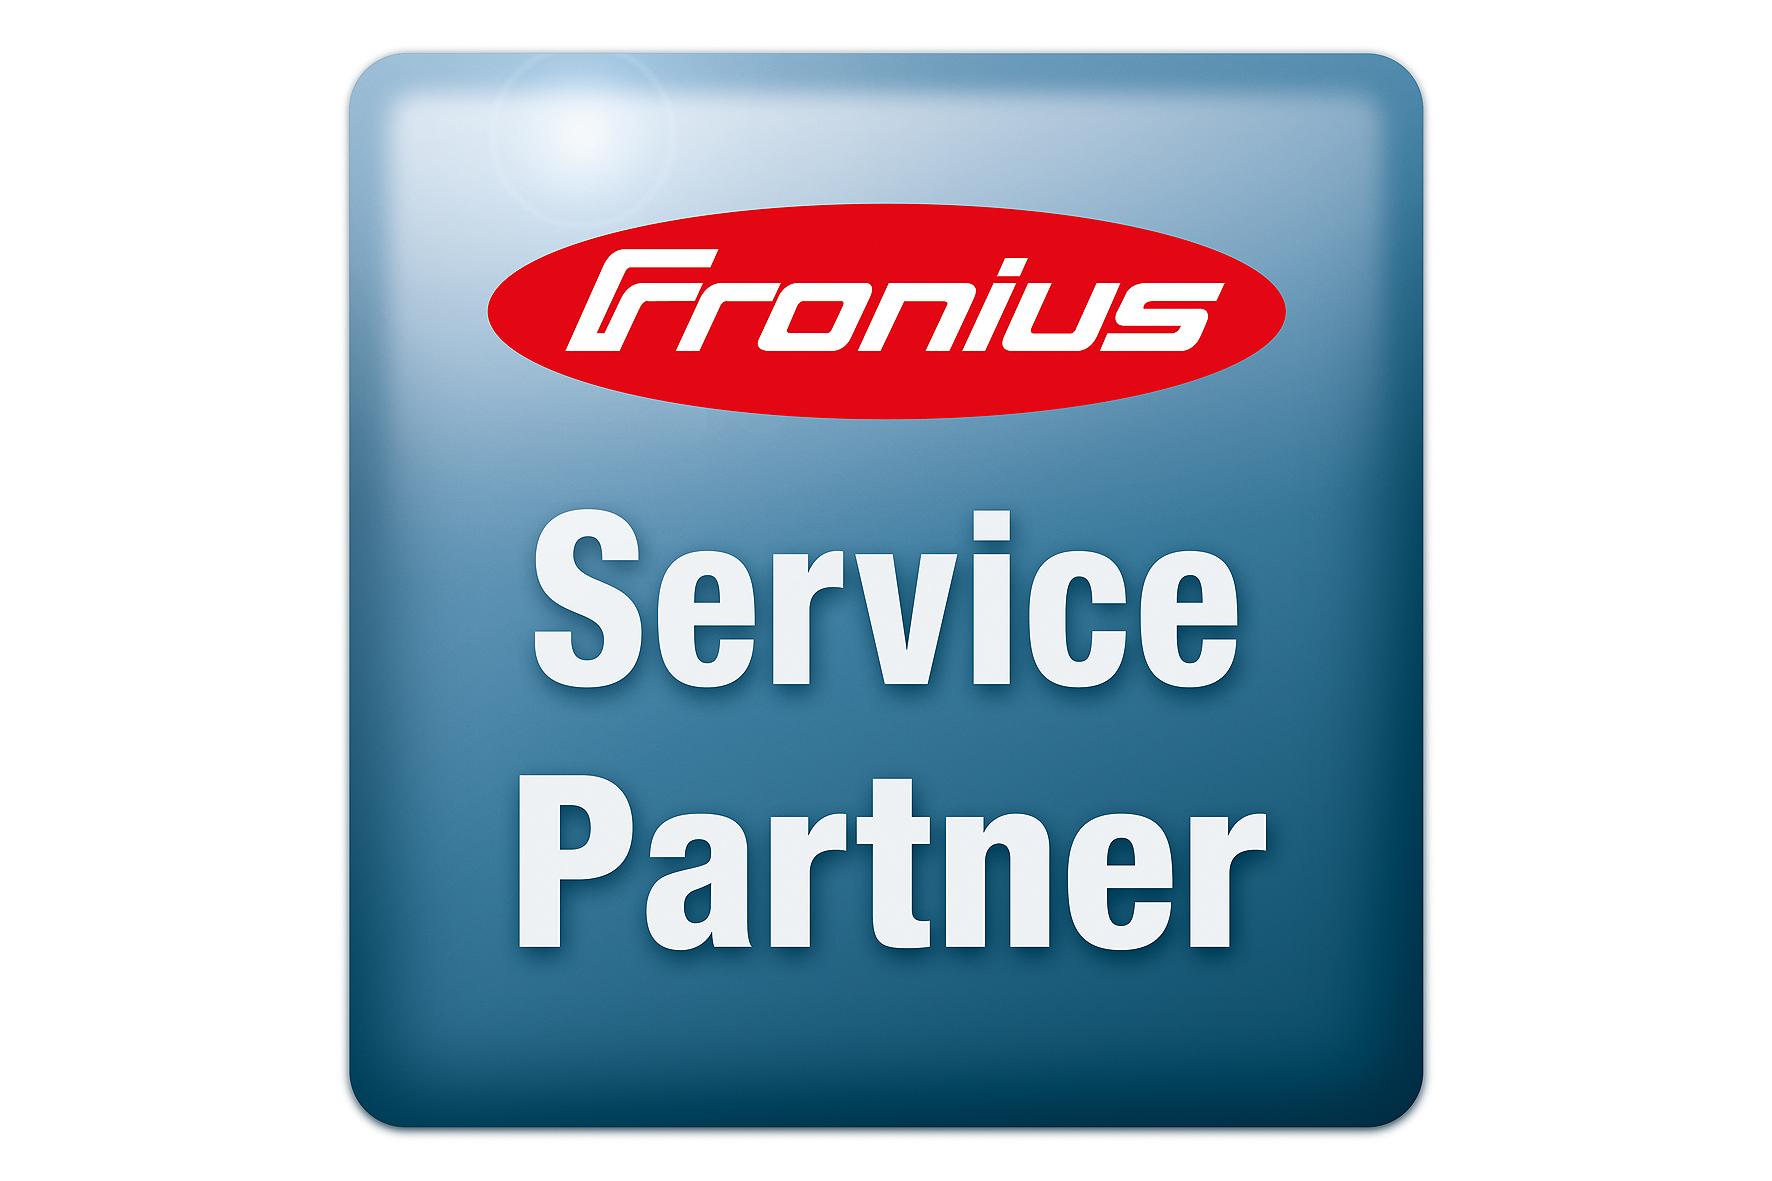 fronius service partner.jpg